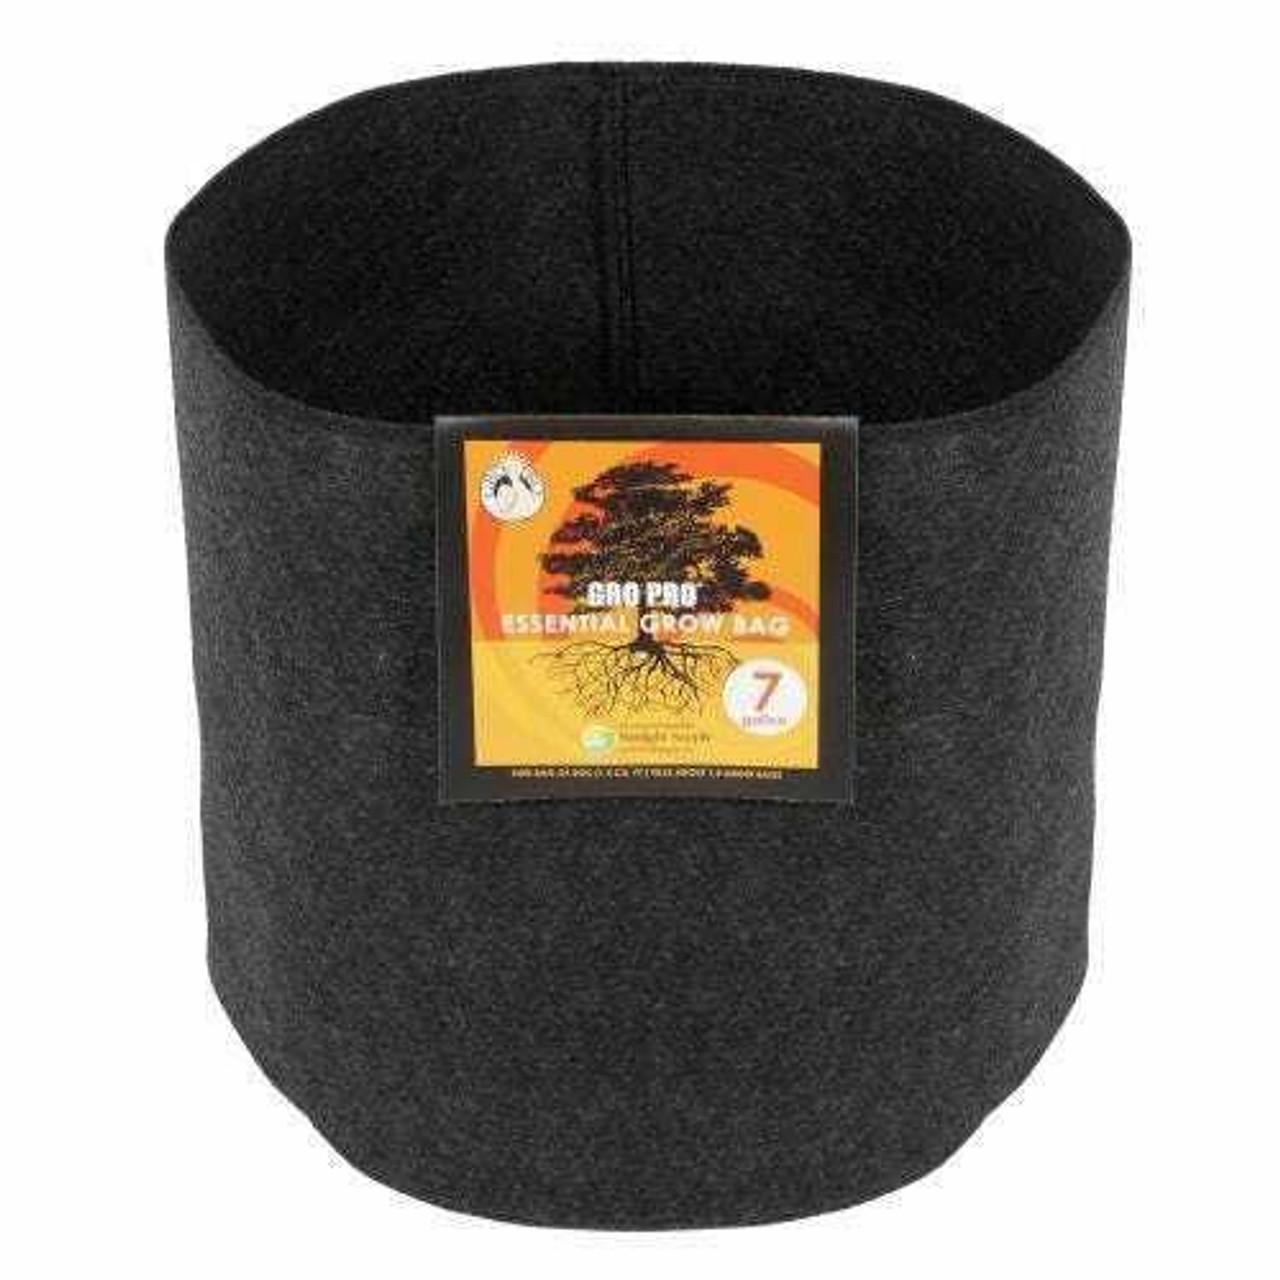 Gro Pro Essential Round Fabric Pot - Black 7 Gallon